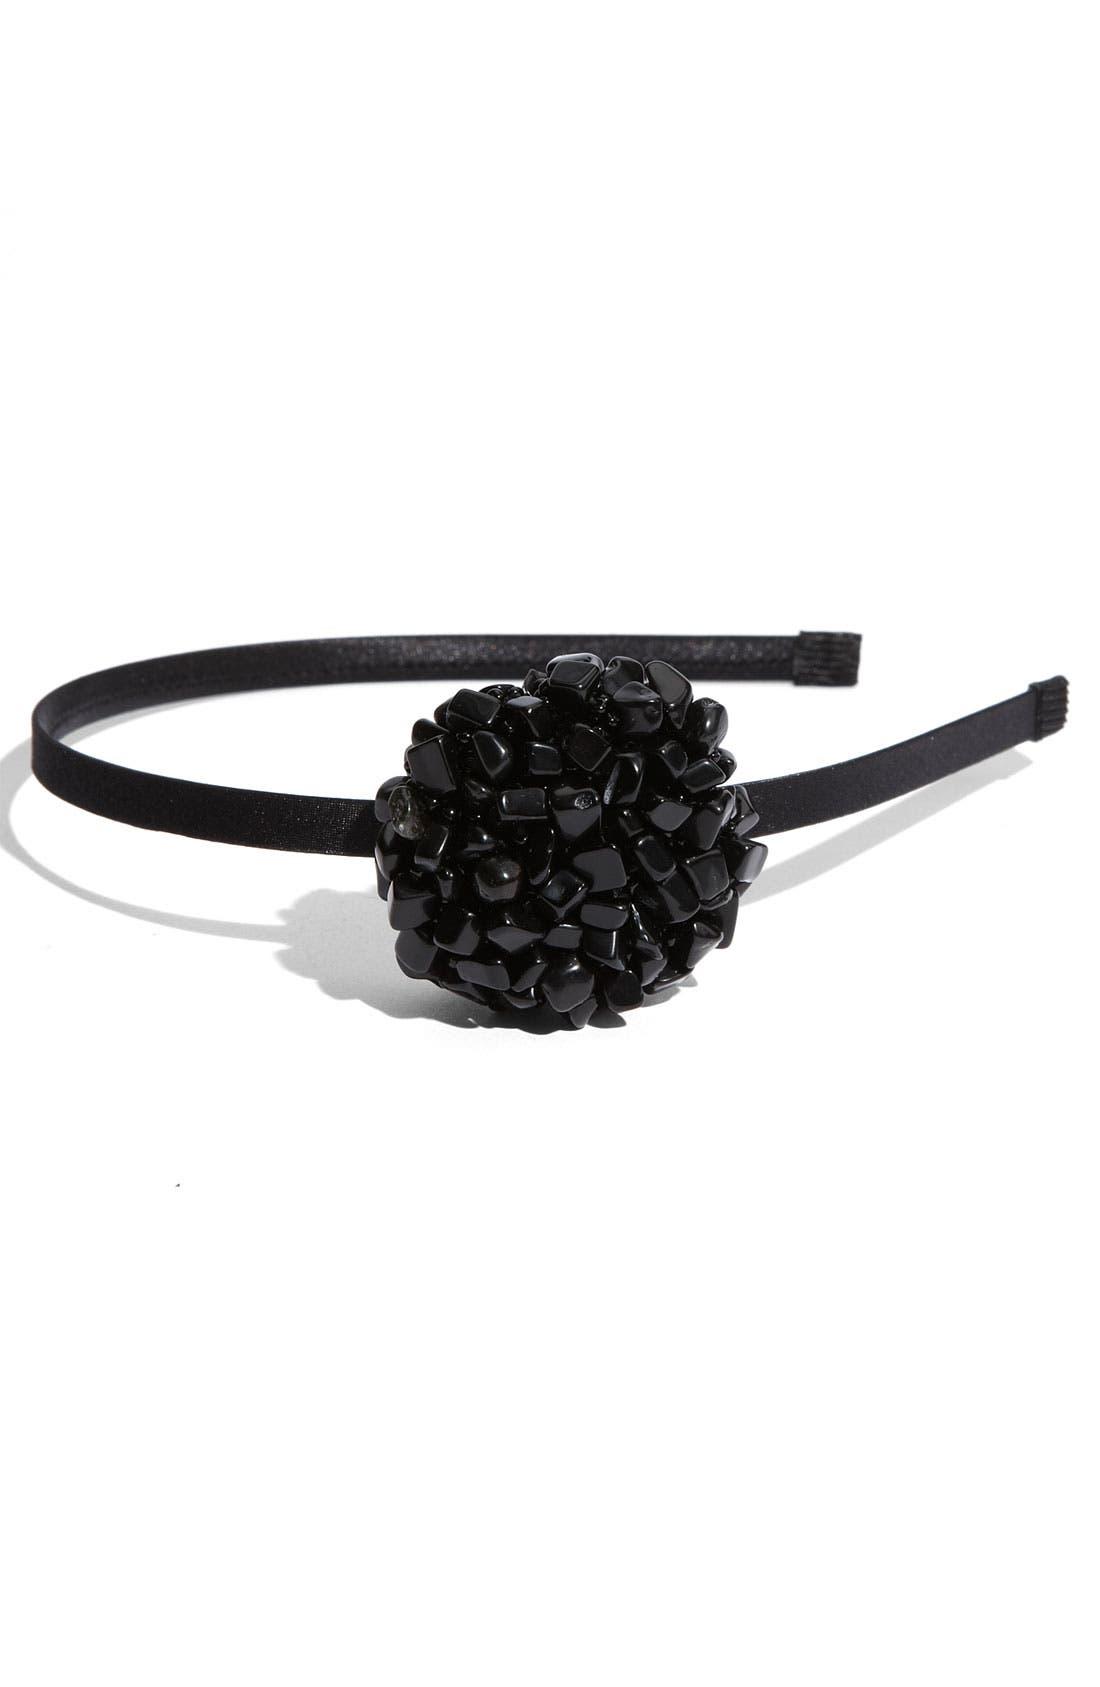 Alternate Image 1 Selected - Tasha 'Rocken' Headband